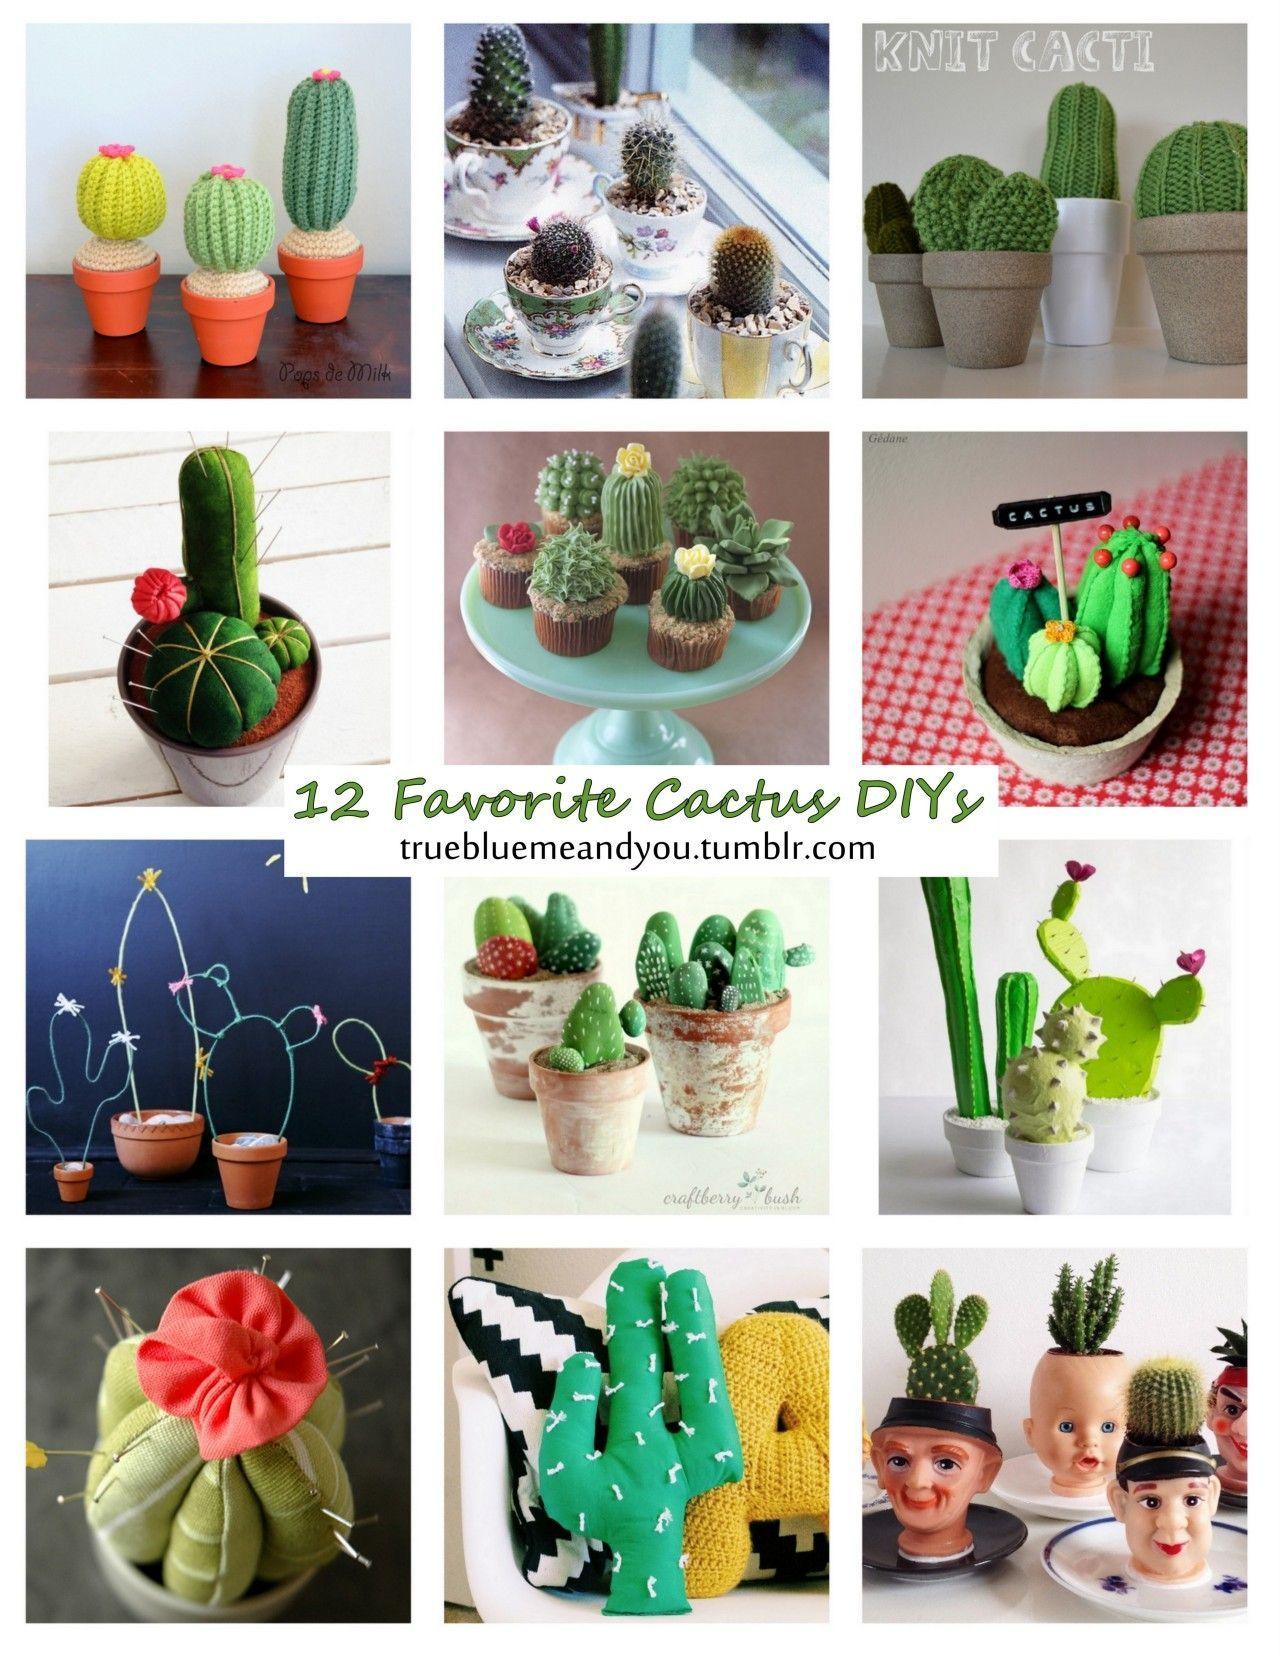 favorite cactus diys roundup by truebluemeandyou cactuscacti